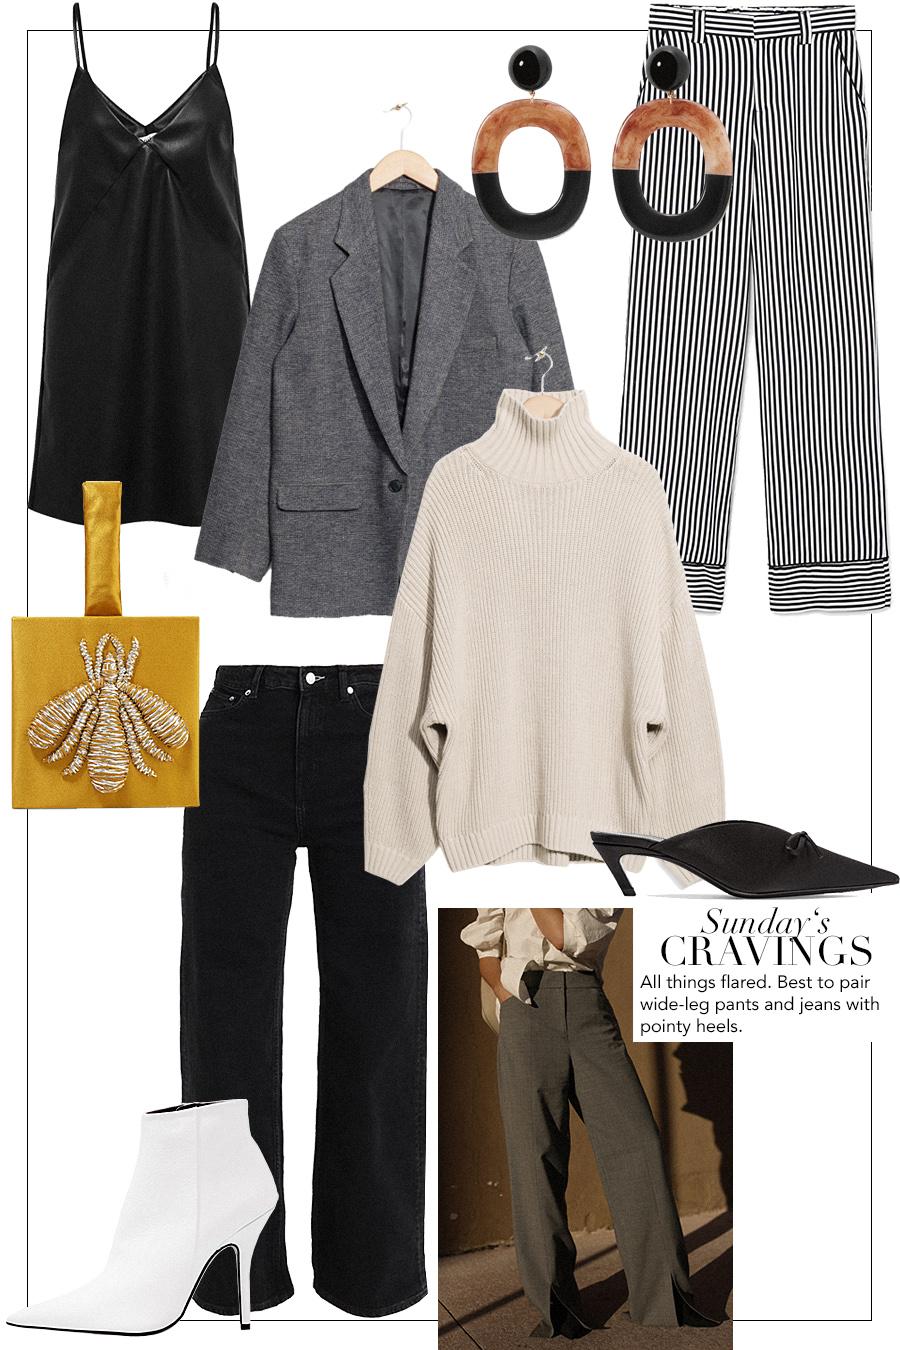 Blazer, Leather dress, Earrings, Satin clutch, Striped pants, Flared jeans, Knit, Prada Bag, White boots.